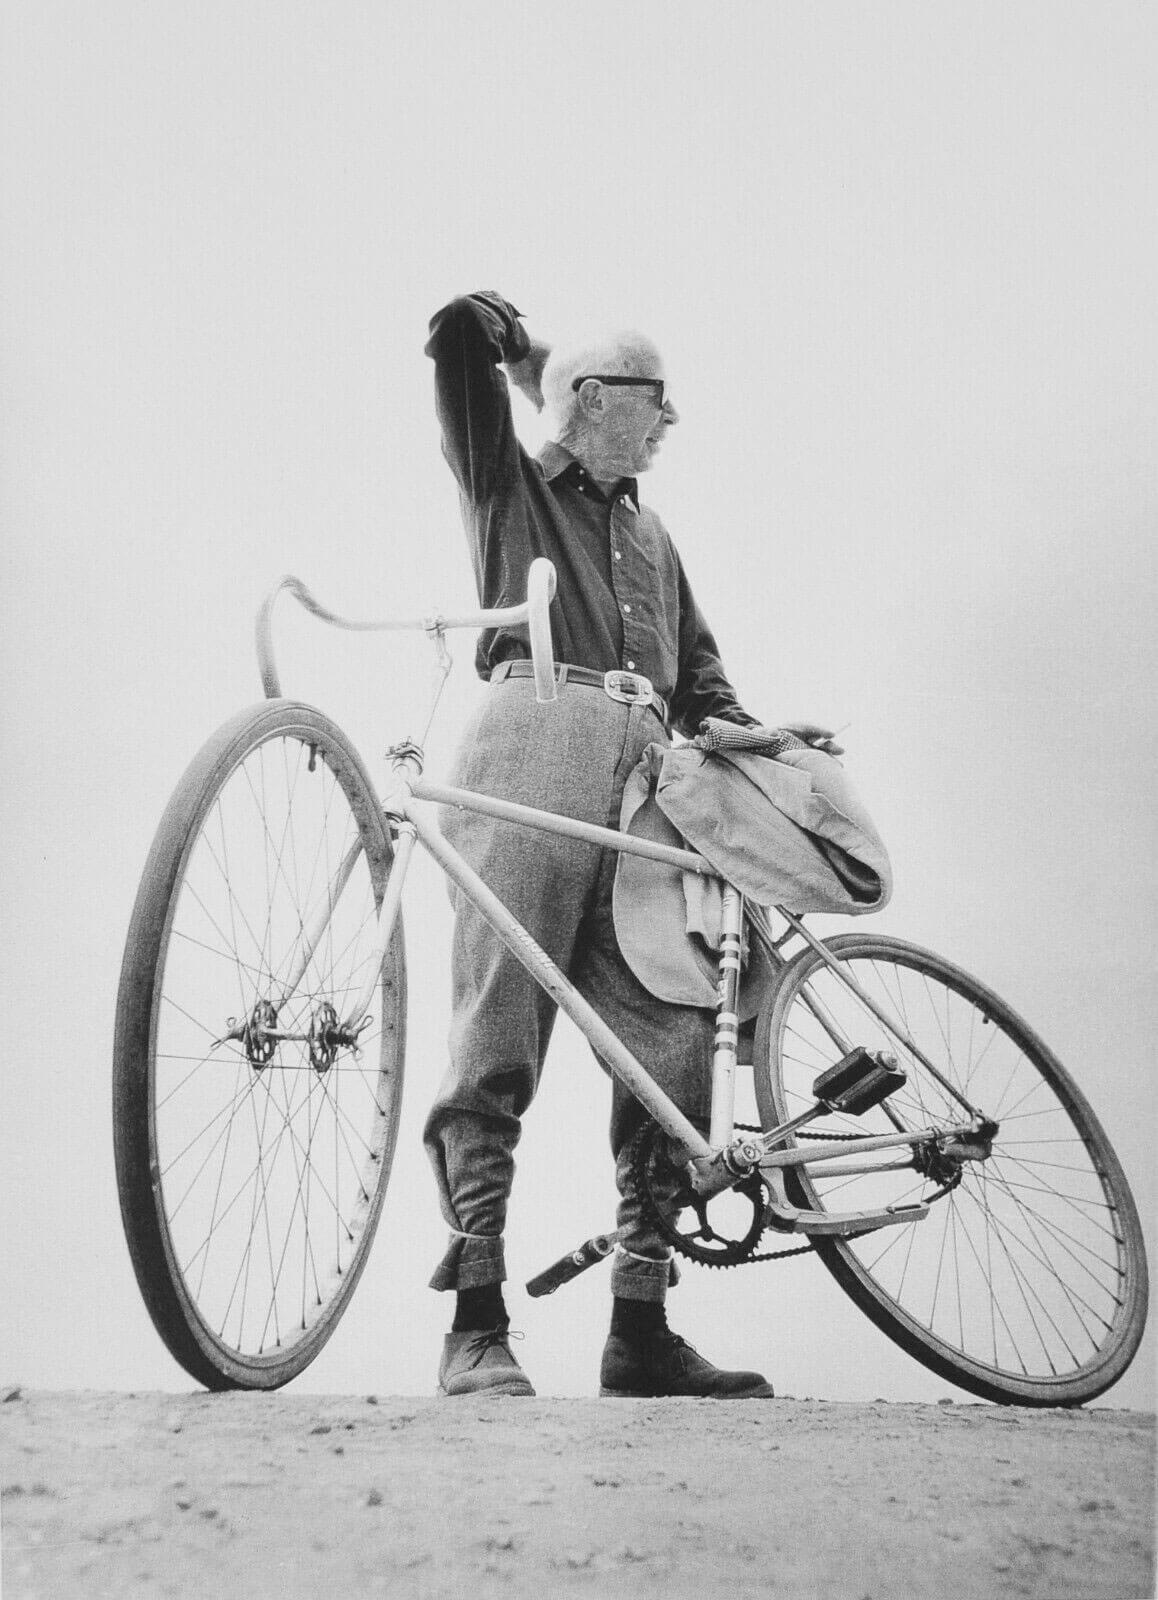 Генри Миллер в1965году. Фото: Peter Gowland